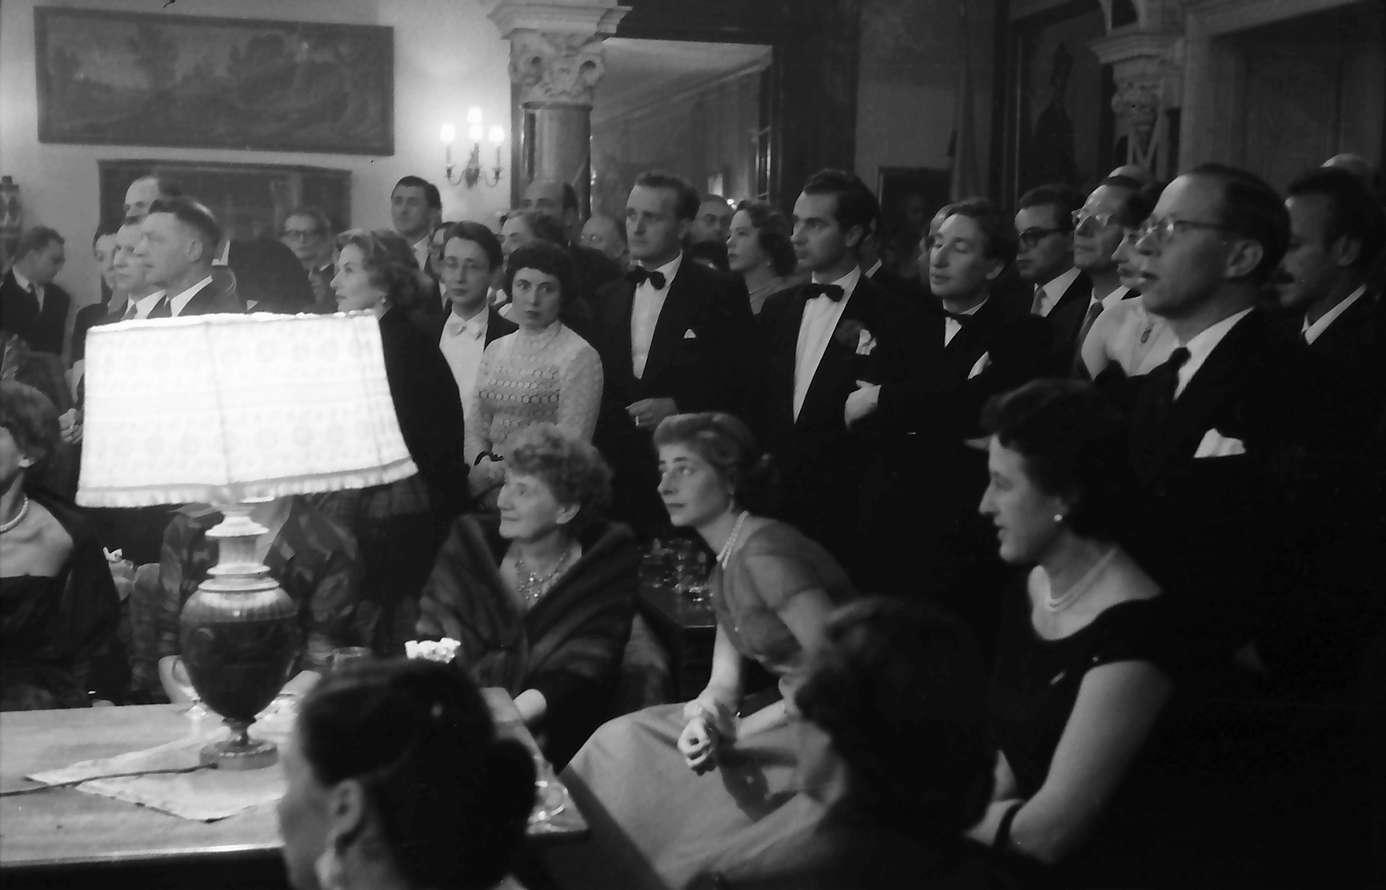 Donaueschingen: Donaueschinger Musiktage; Empfang im Schloss; Gäste in der Diele (um Lampe), Bild 1